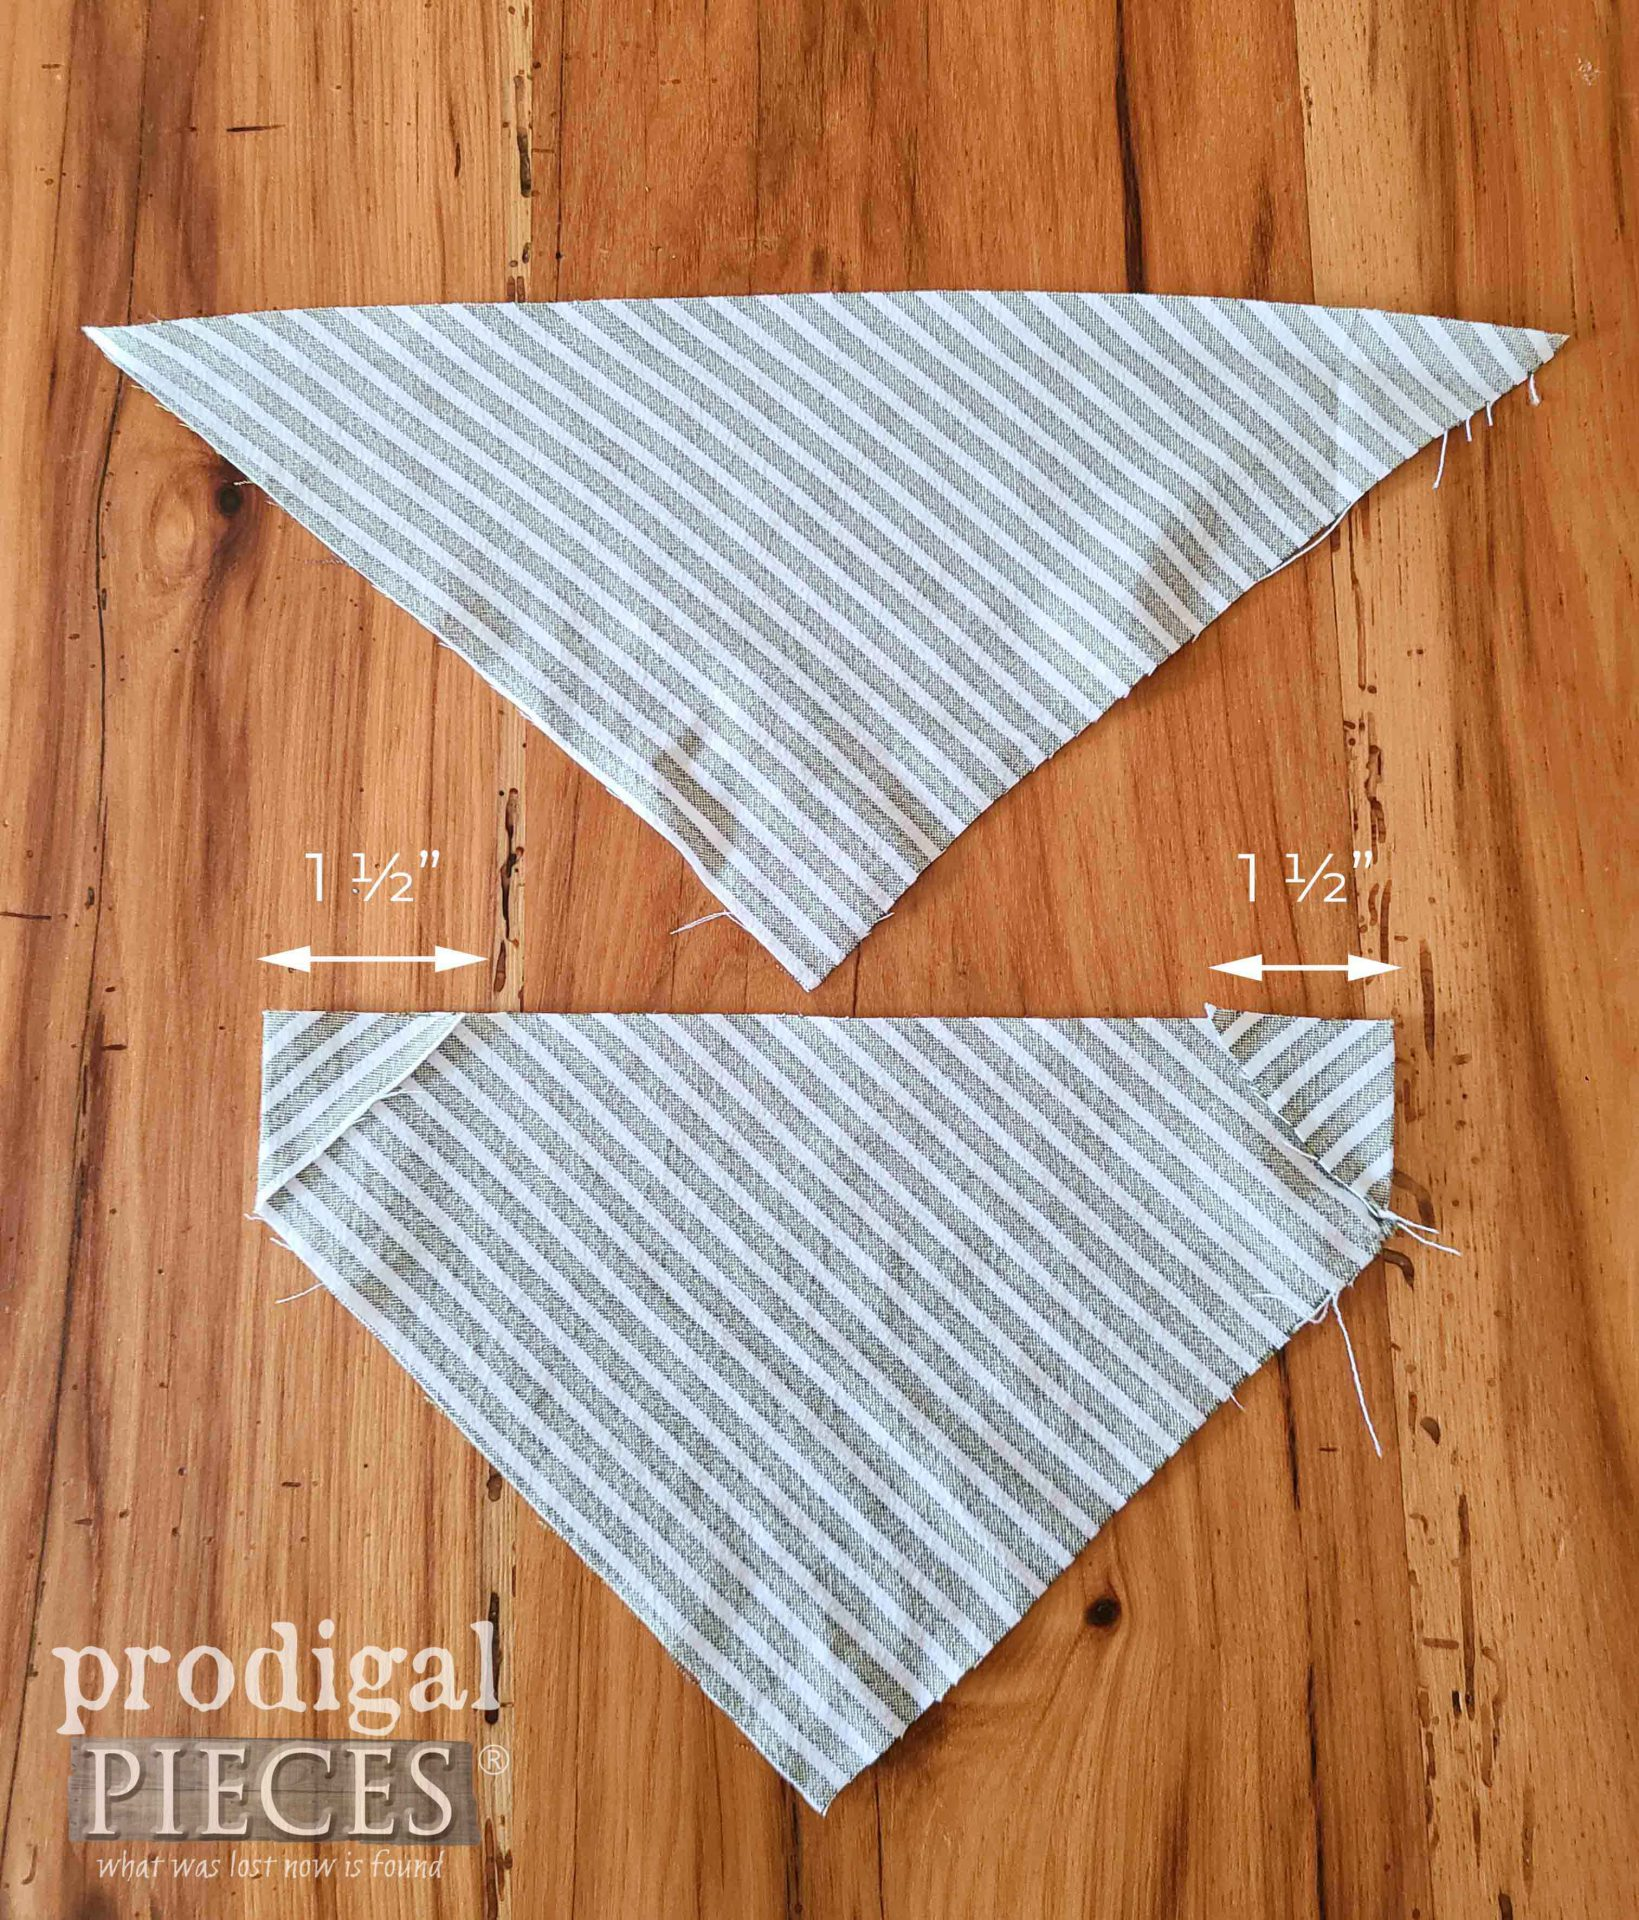 First Fold Corner of Compact Bag   prodigalpieces.com